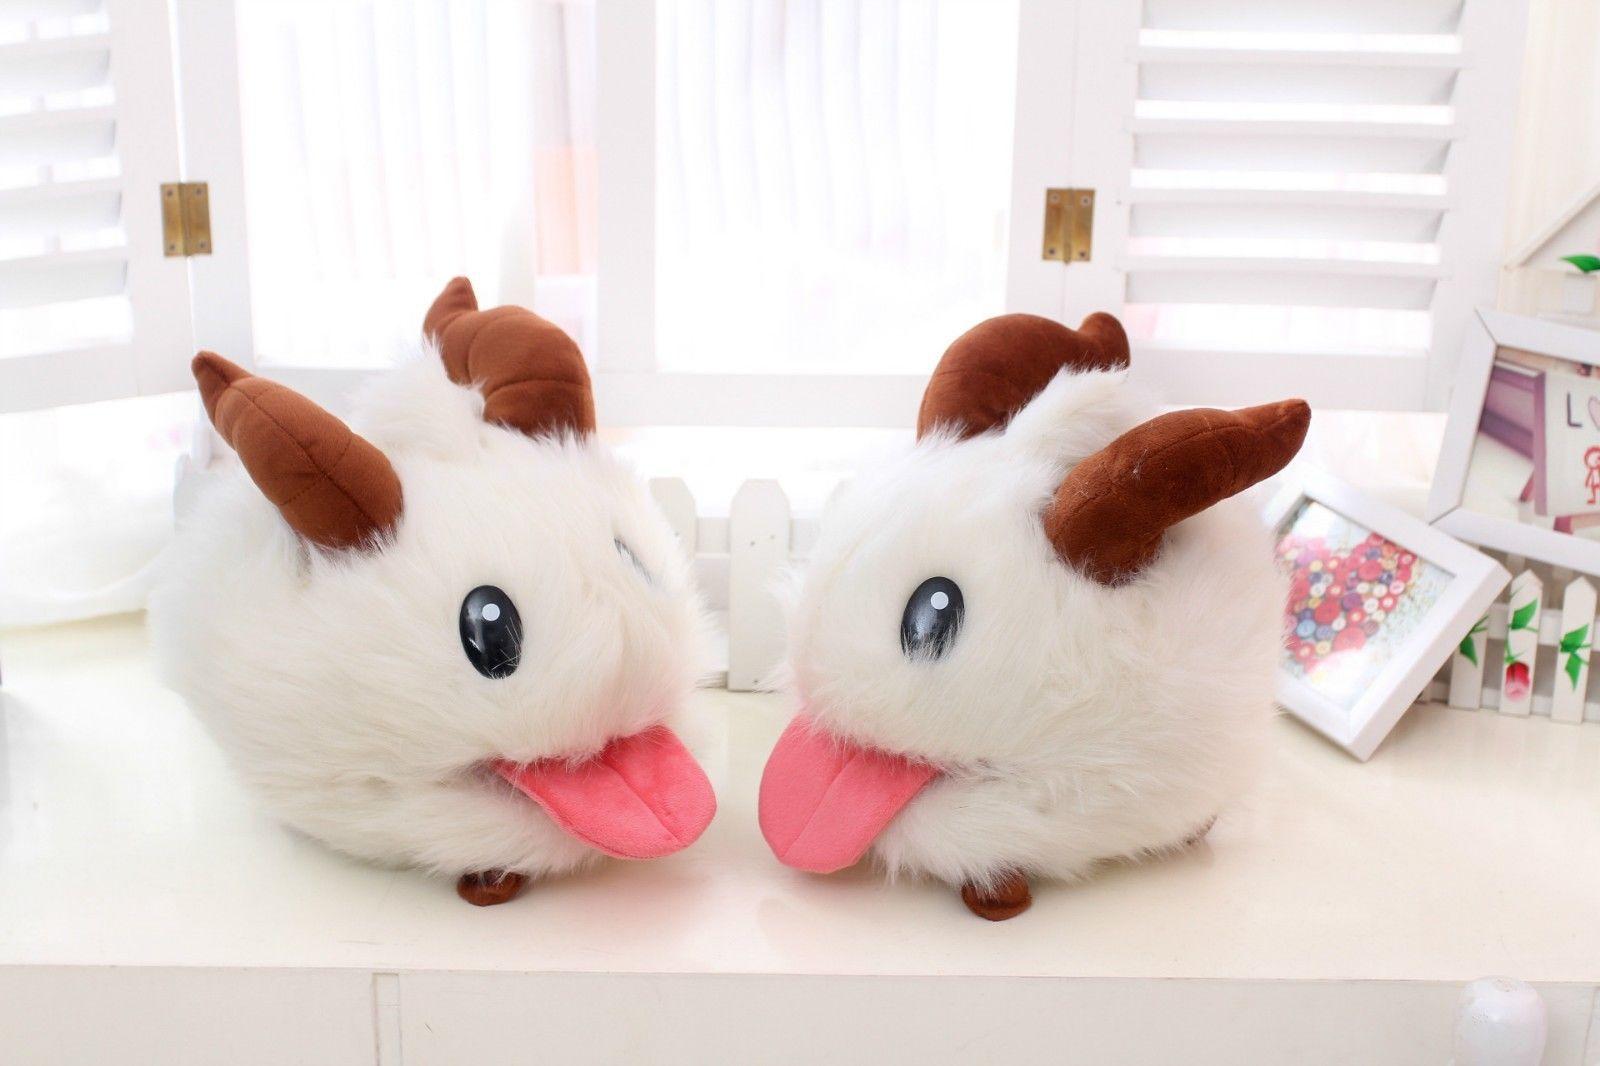 Soft Stuffed Doll League of Legends Gooney Plush Figure Toy Cute Newest Toys 4